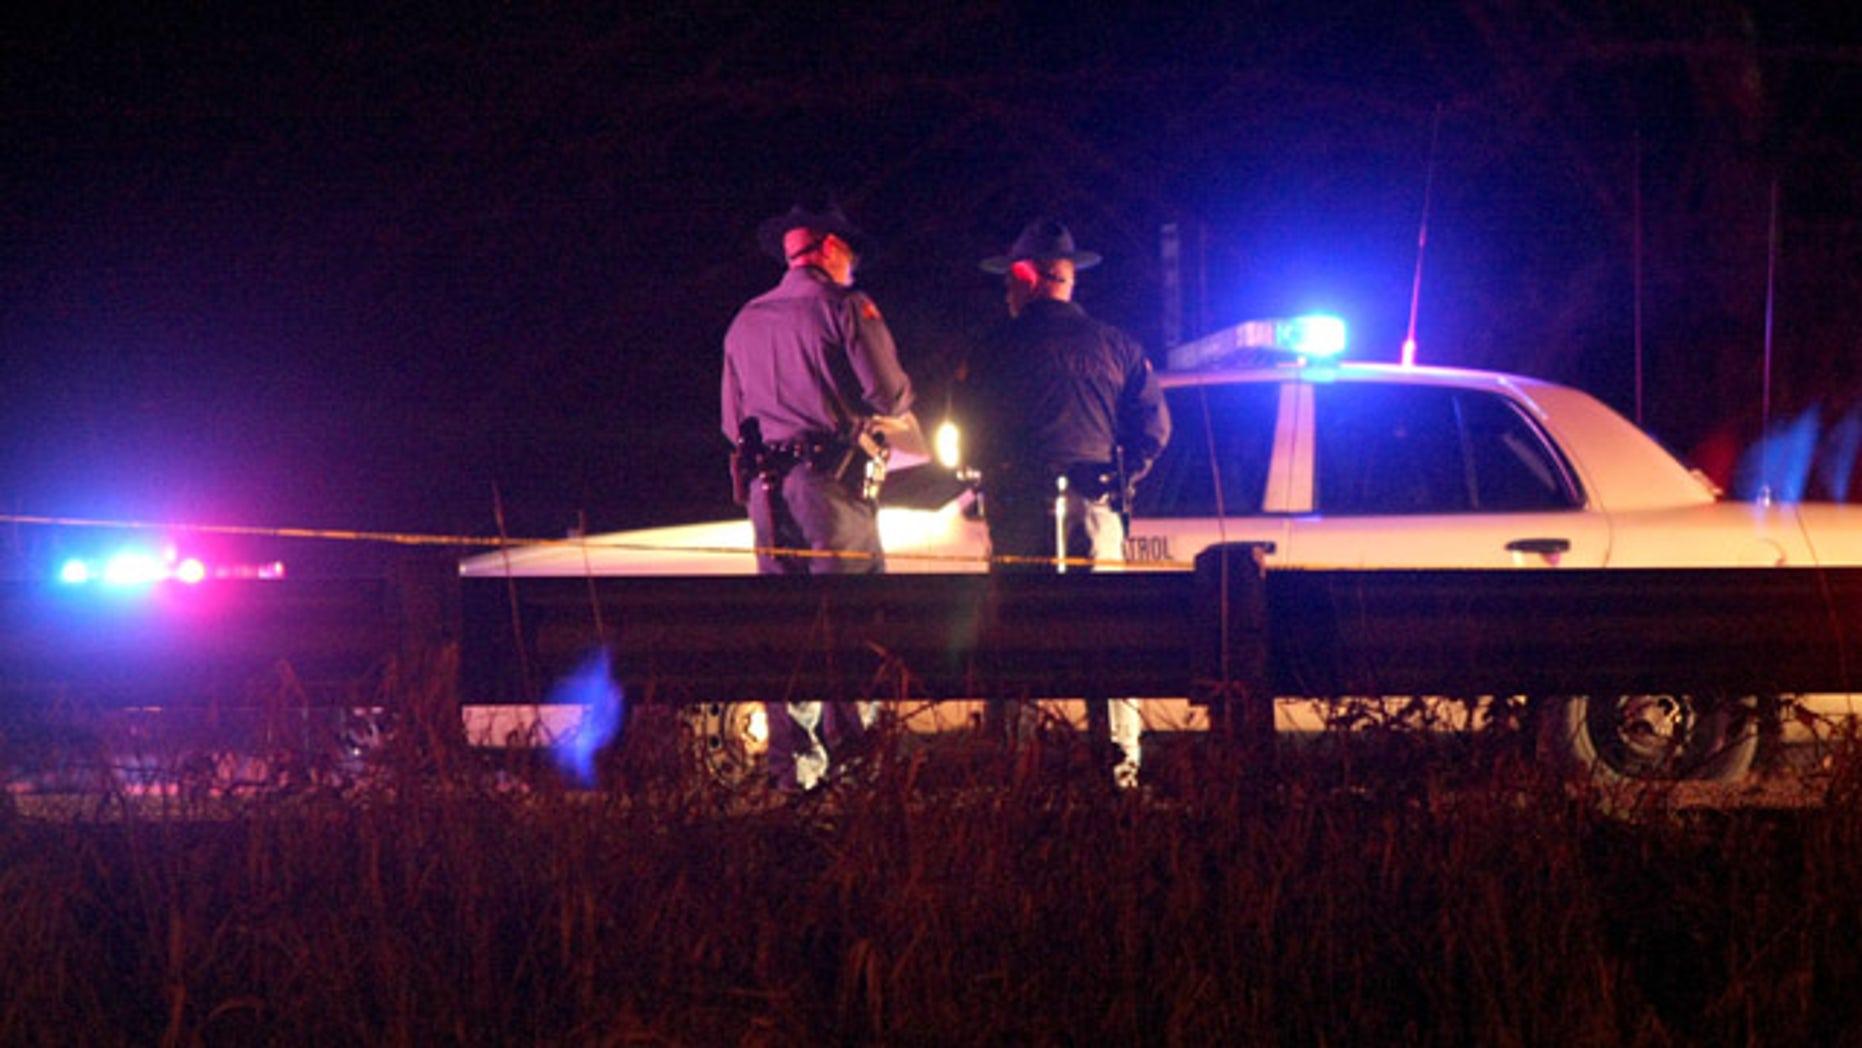 Suspect in Washington trooper death shoots self, dies | Fox News